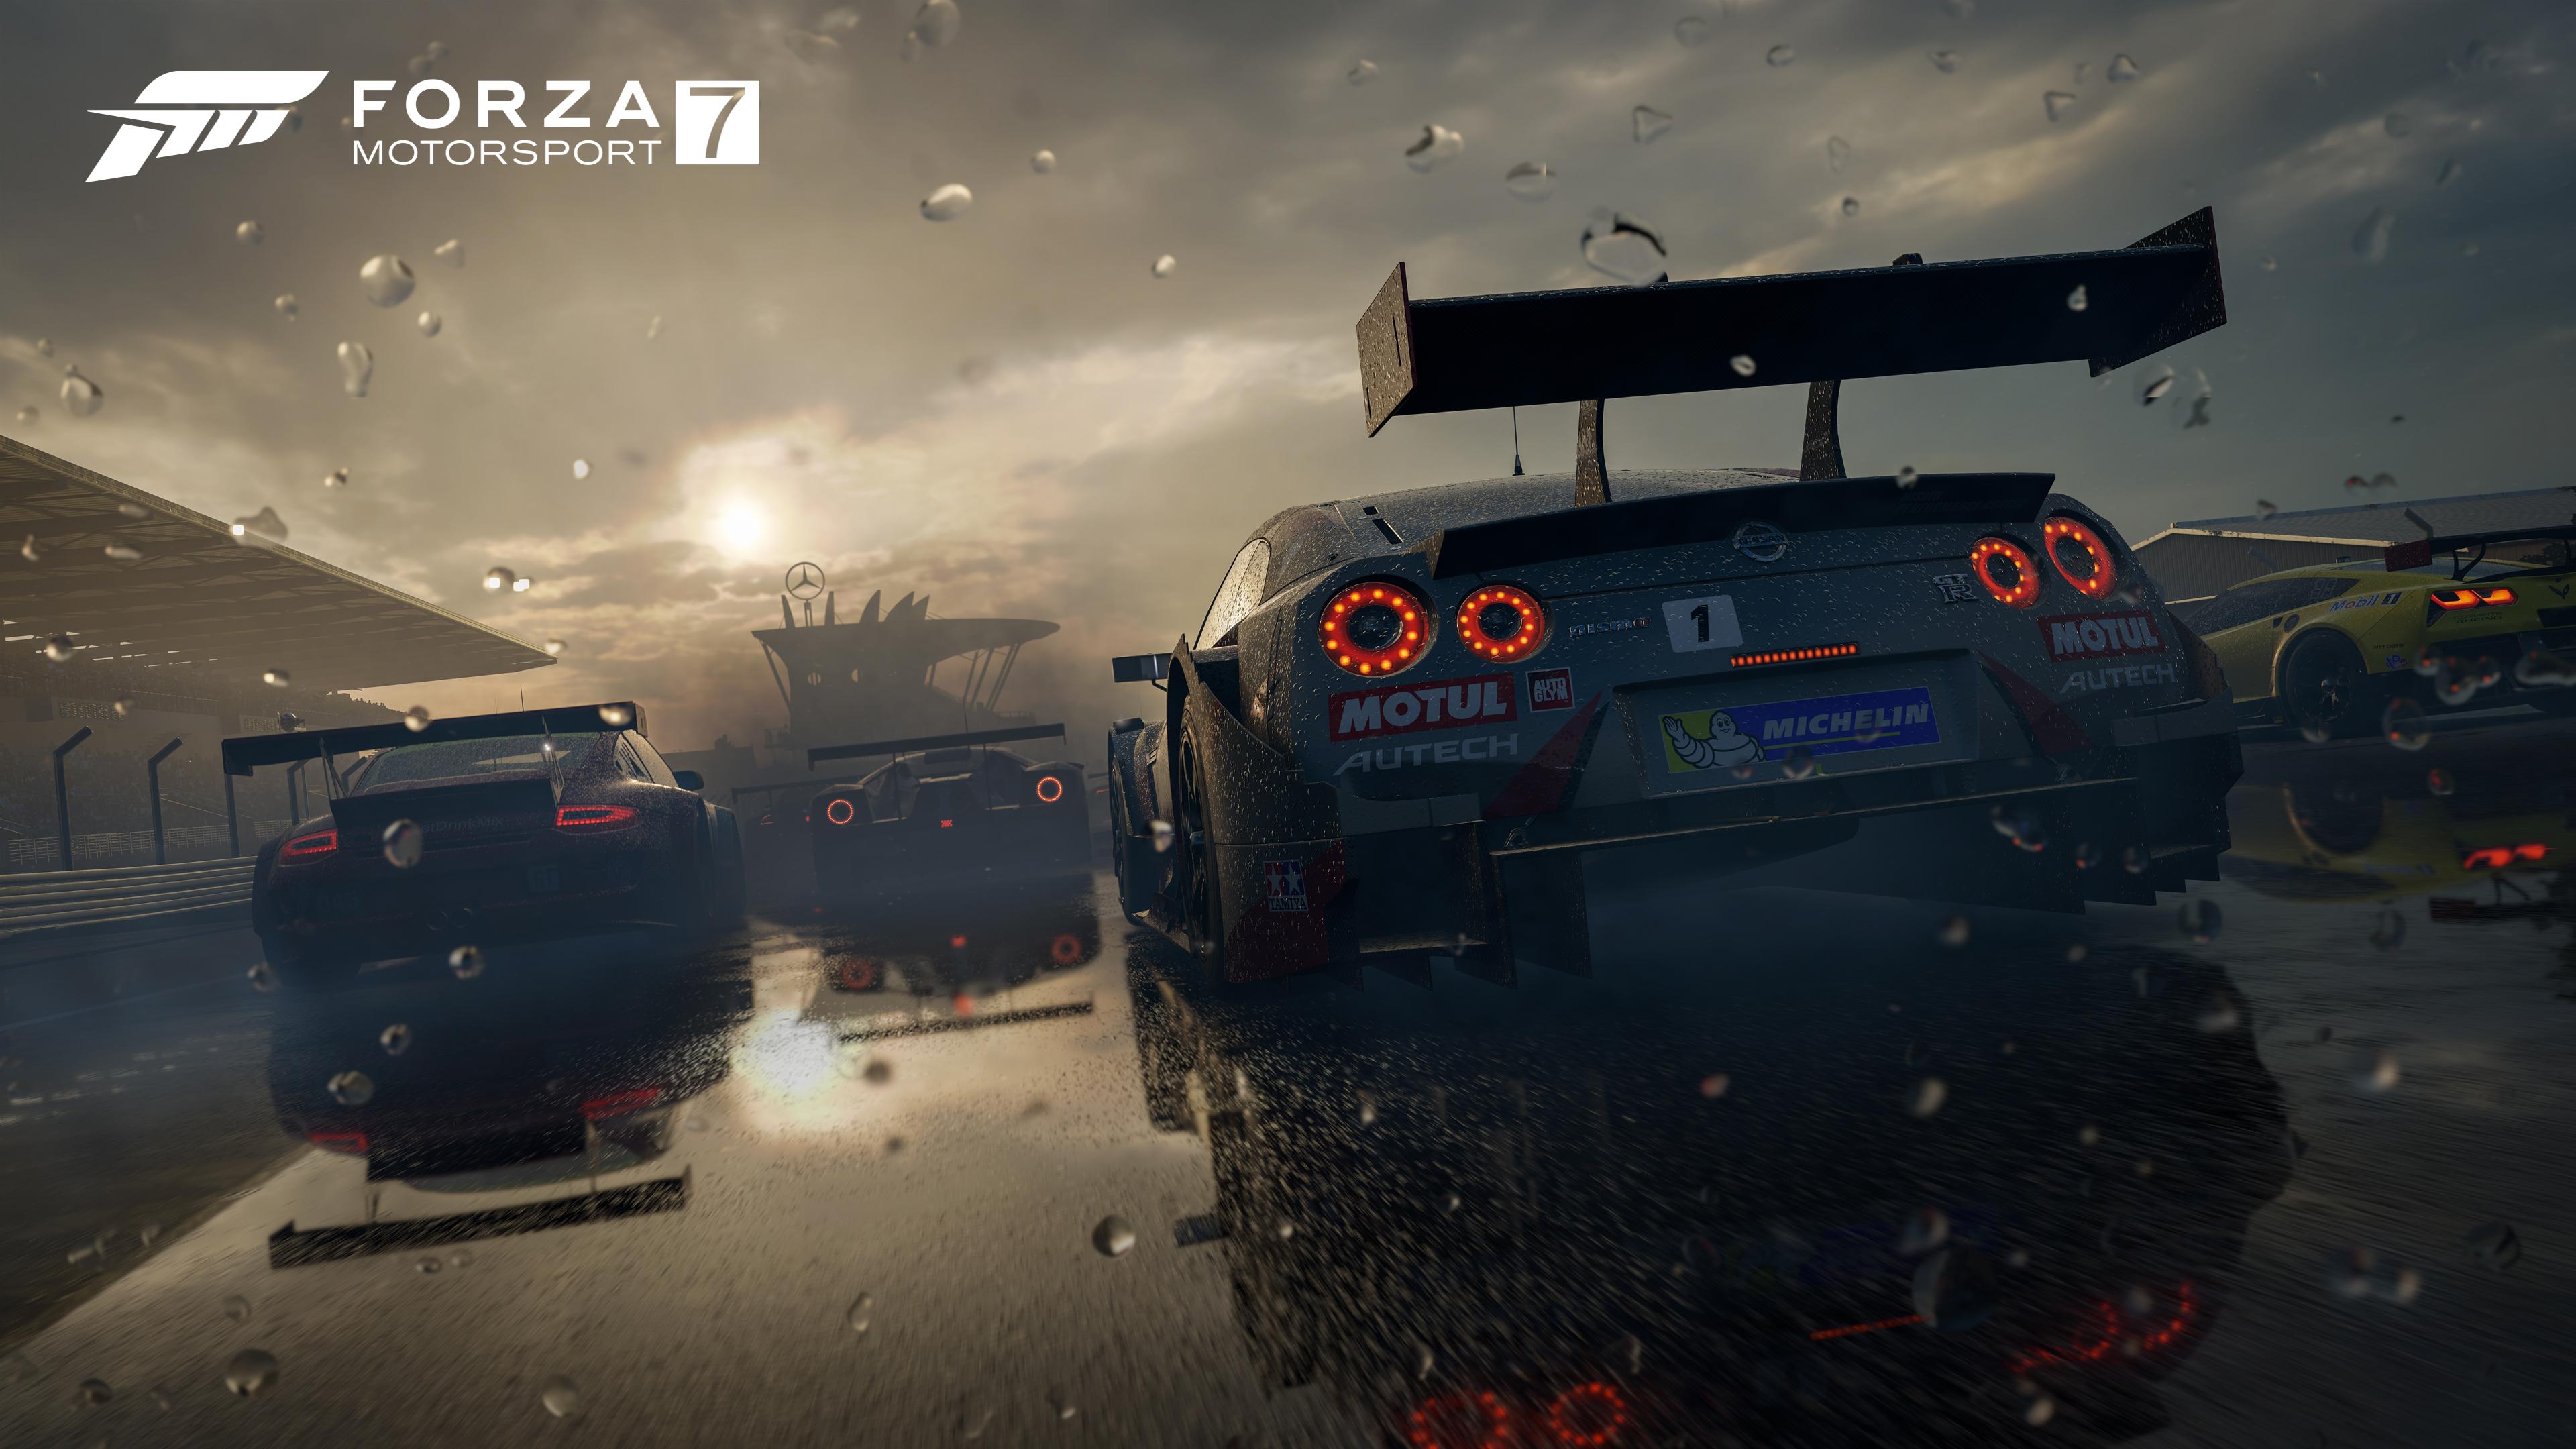 Forza7_E3_PressKit_03_OtherSideOfTheStor